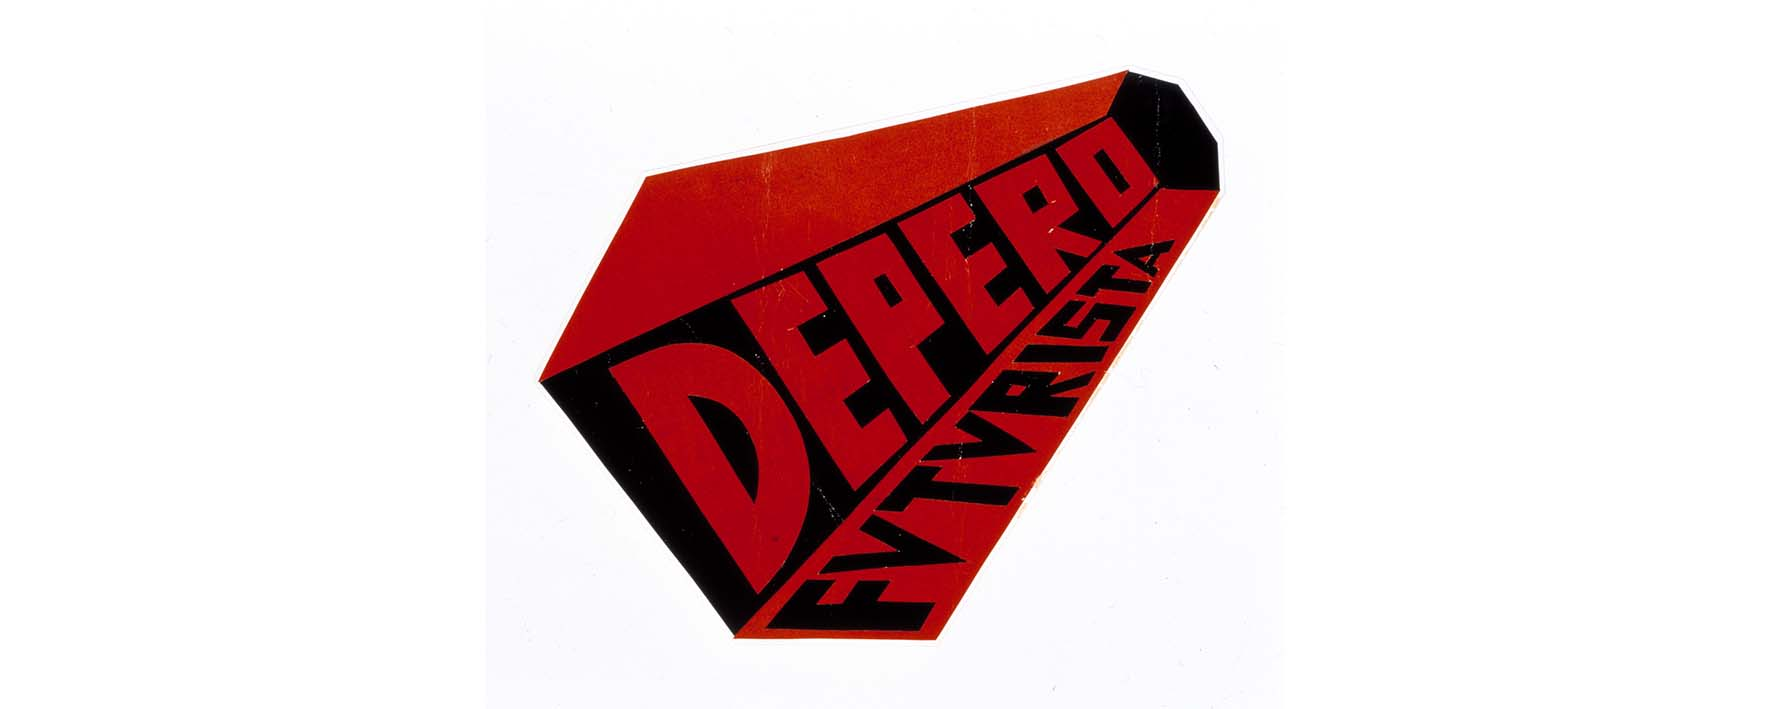 05 Depero Studio per marchio pubblicitario Depero Futurist